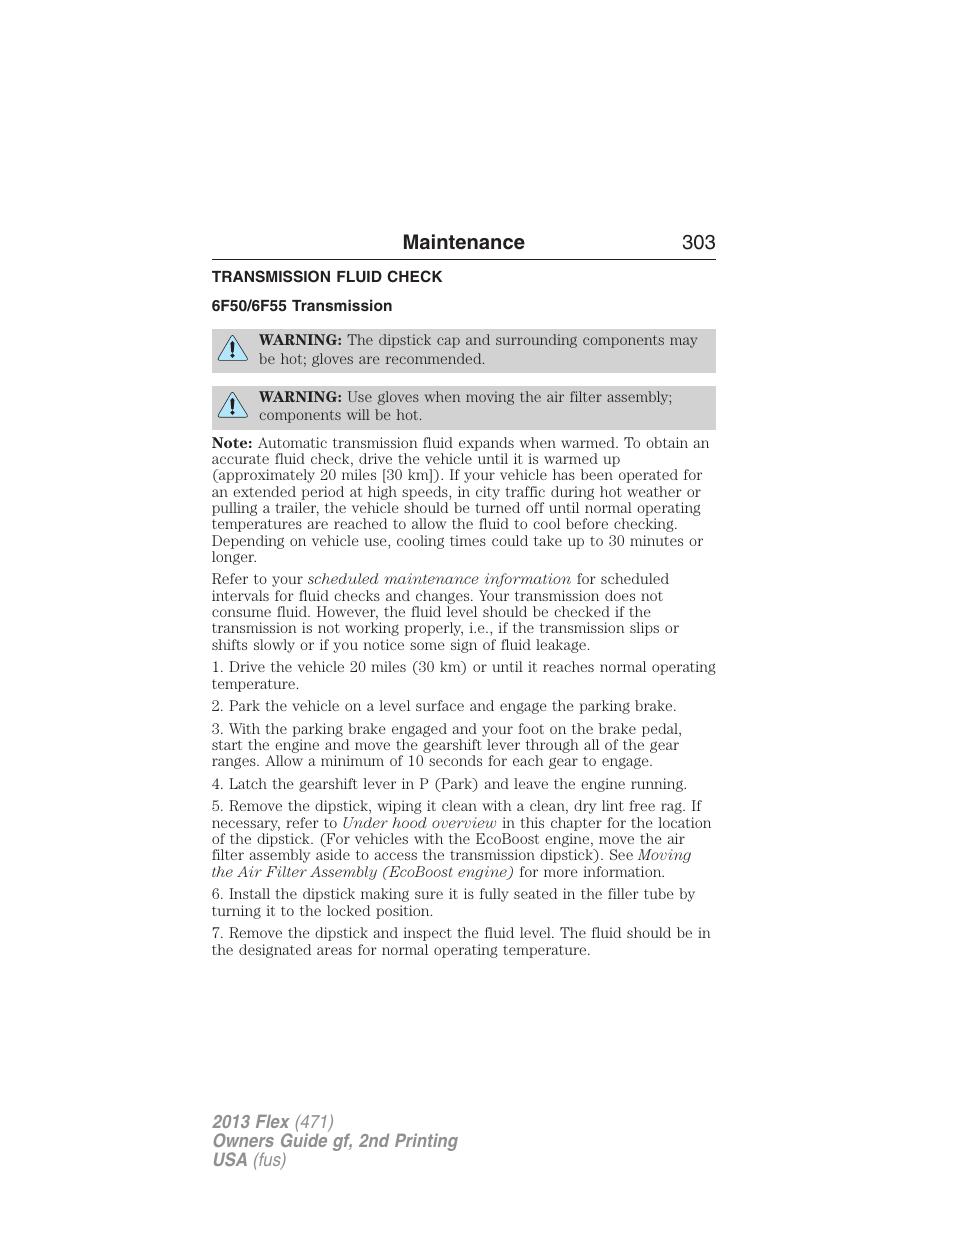 ford flex maintenance manual